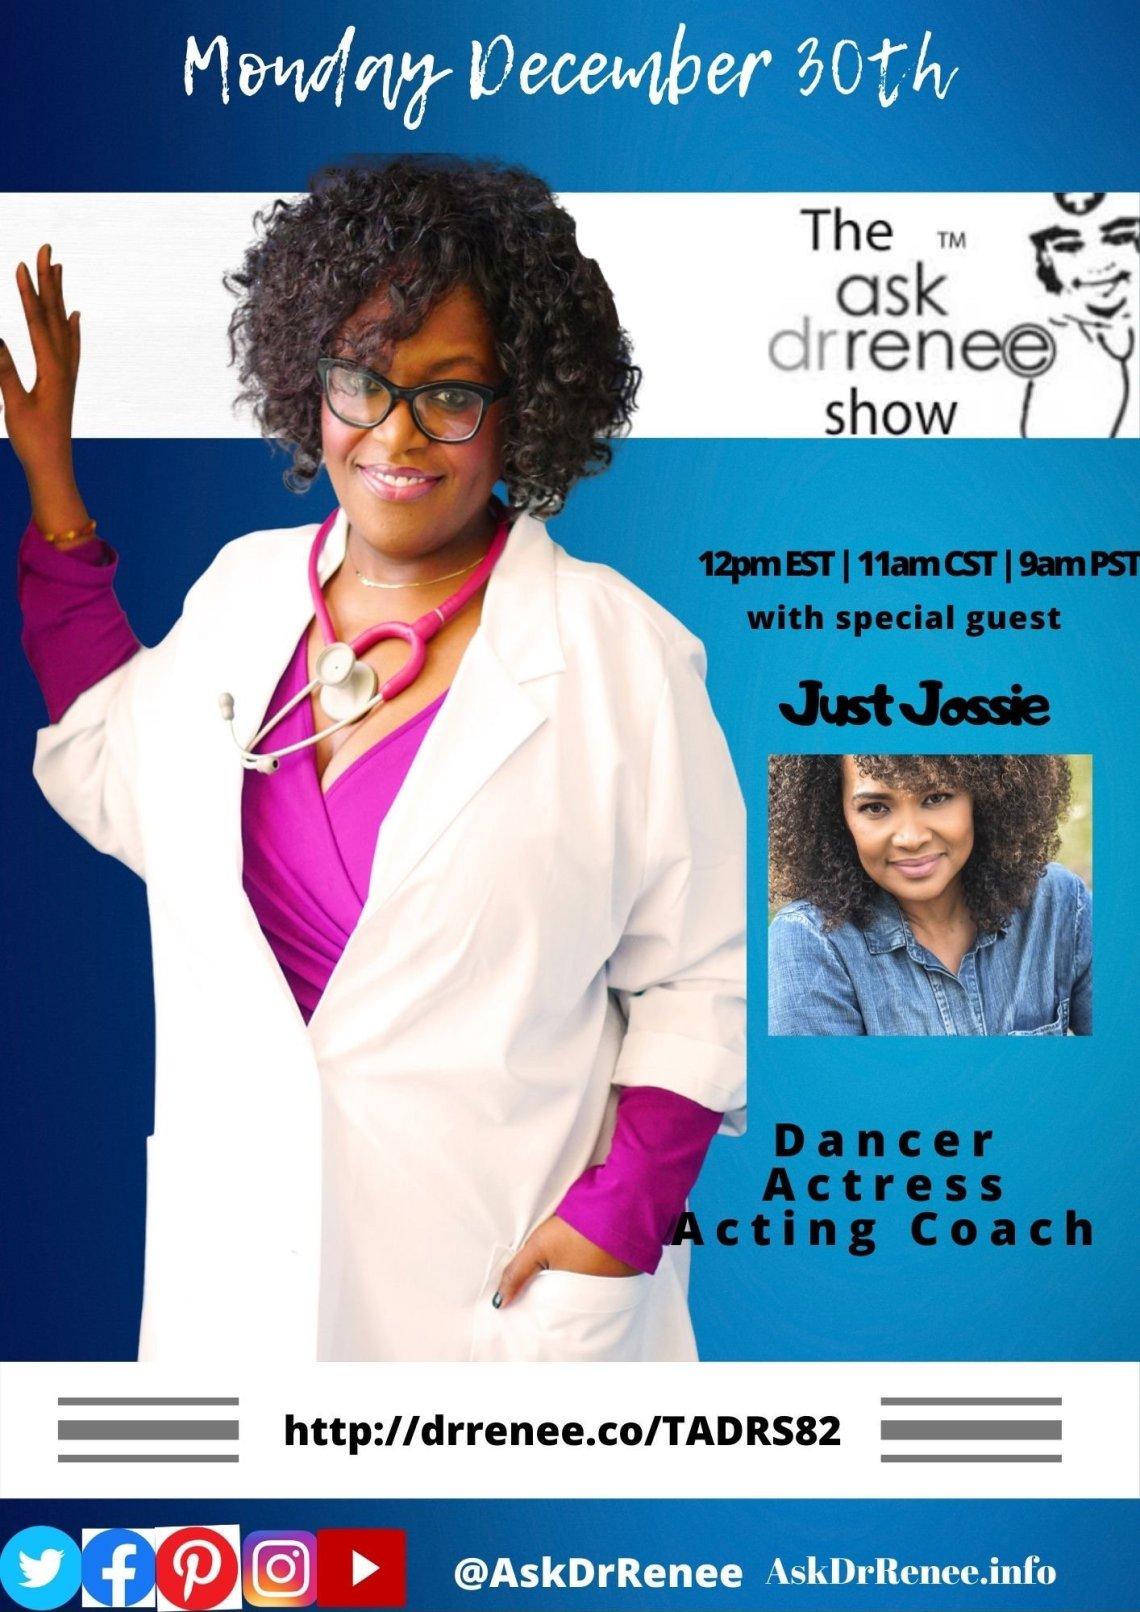 Ask Dr. Renee,Ask Dr. Renee Show,Talk Show Host,Oprah Winfrey,talk show,Jossie Harris,in living color,Fly girls,Dancer,Jossie Harris Thacker,music,dancer,hiphop,Jennifer Lopez,acting coaching class,talk show hosts laughing, Jossie Harris, Dancer, Actress, Acting Coach, Fly Girl, In Living Color, The Ask Dr. Renee Show, Dr. Renee, Dr. Renee Matthews, Ask Dr. Renee